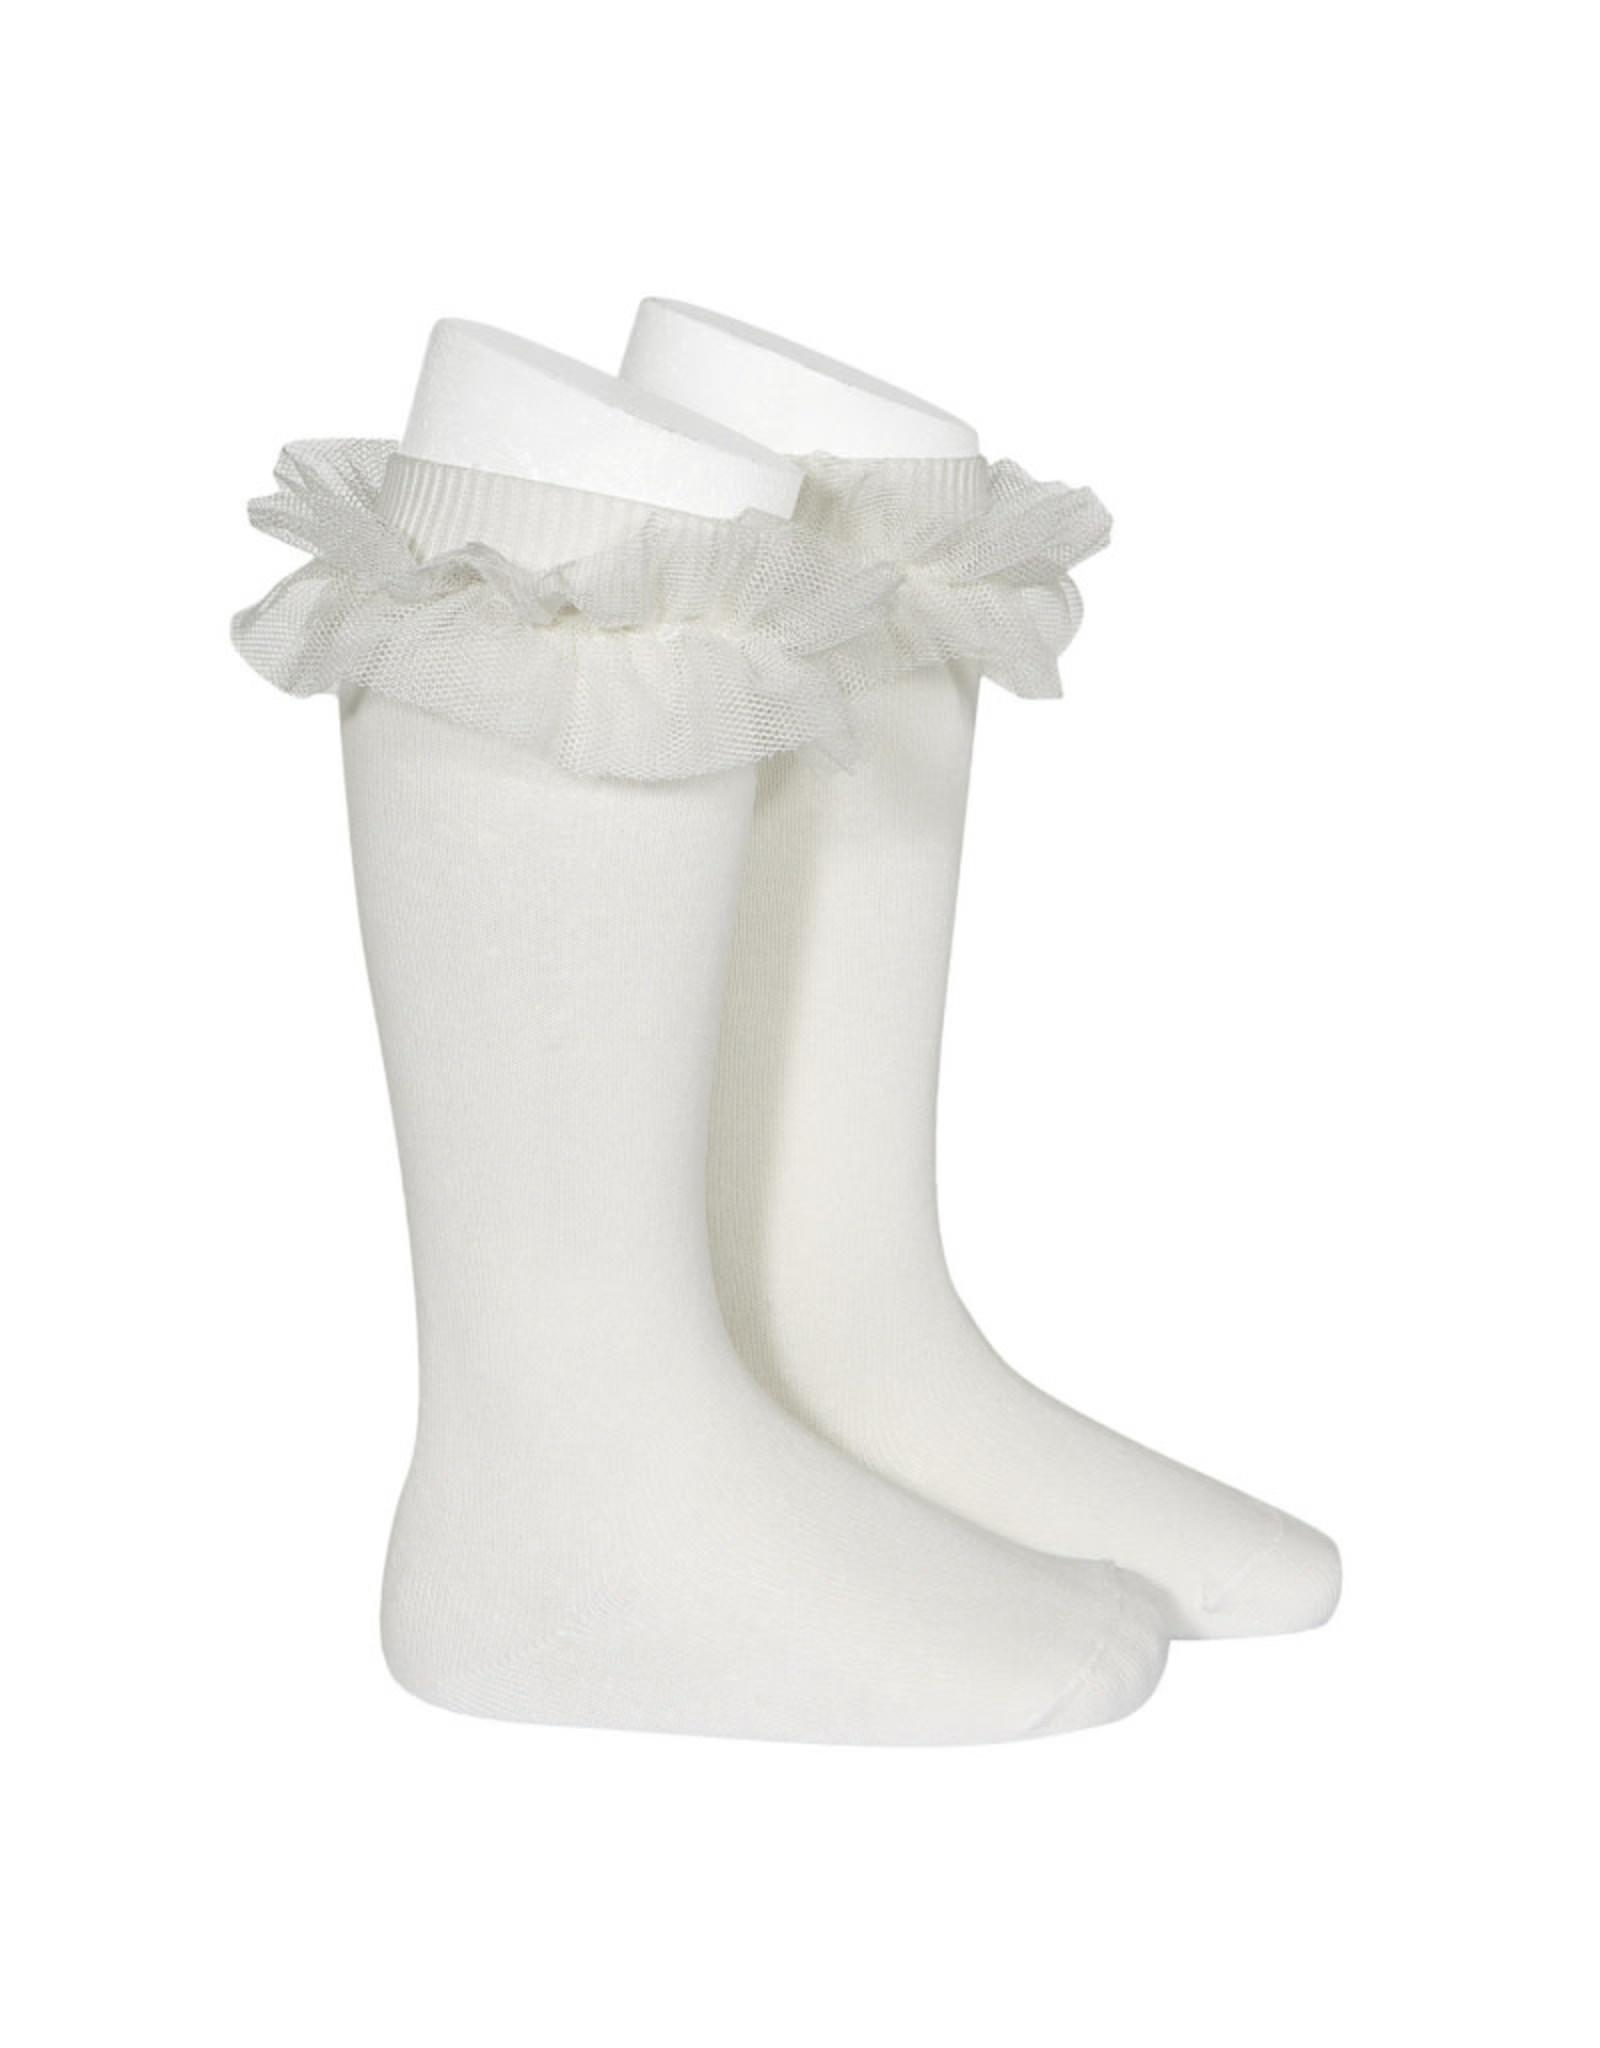 CONDOR Cream Tulle Knee Socks